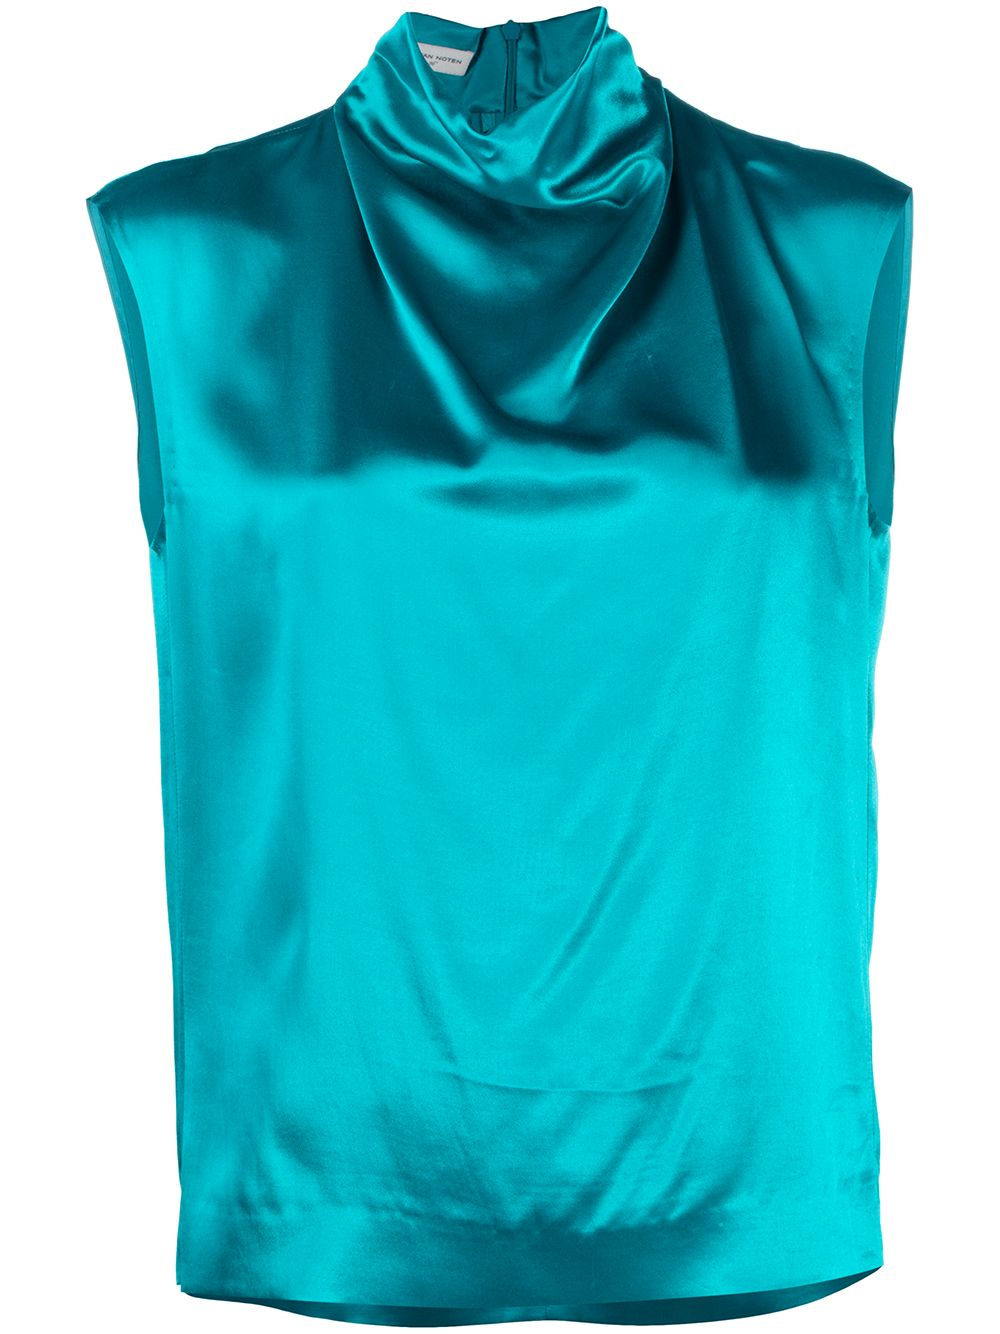 Turquoise blue Chiala high-neck satin blouse  DRIES VAN NOTEN |  | CHIALA-1042503